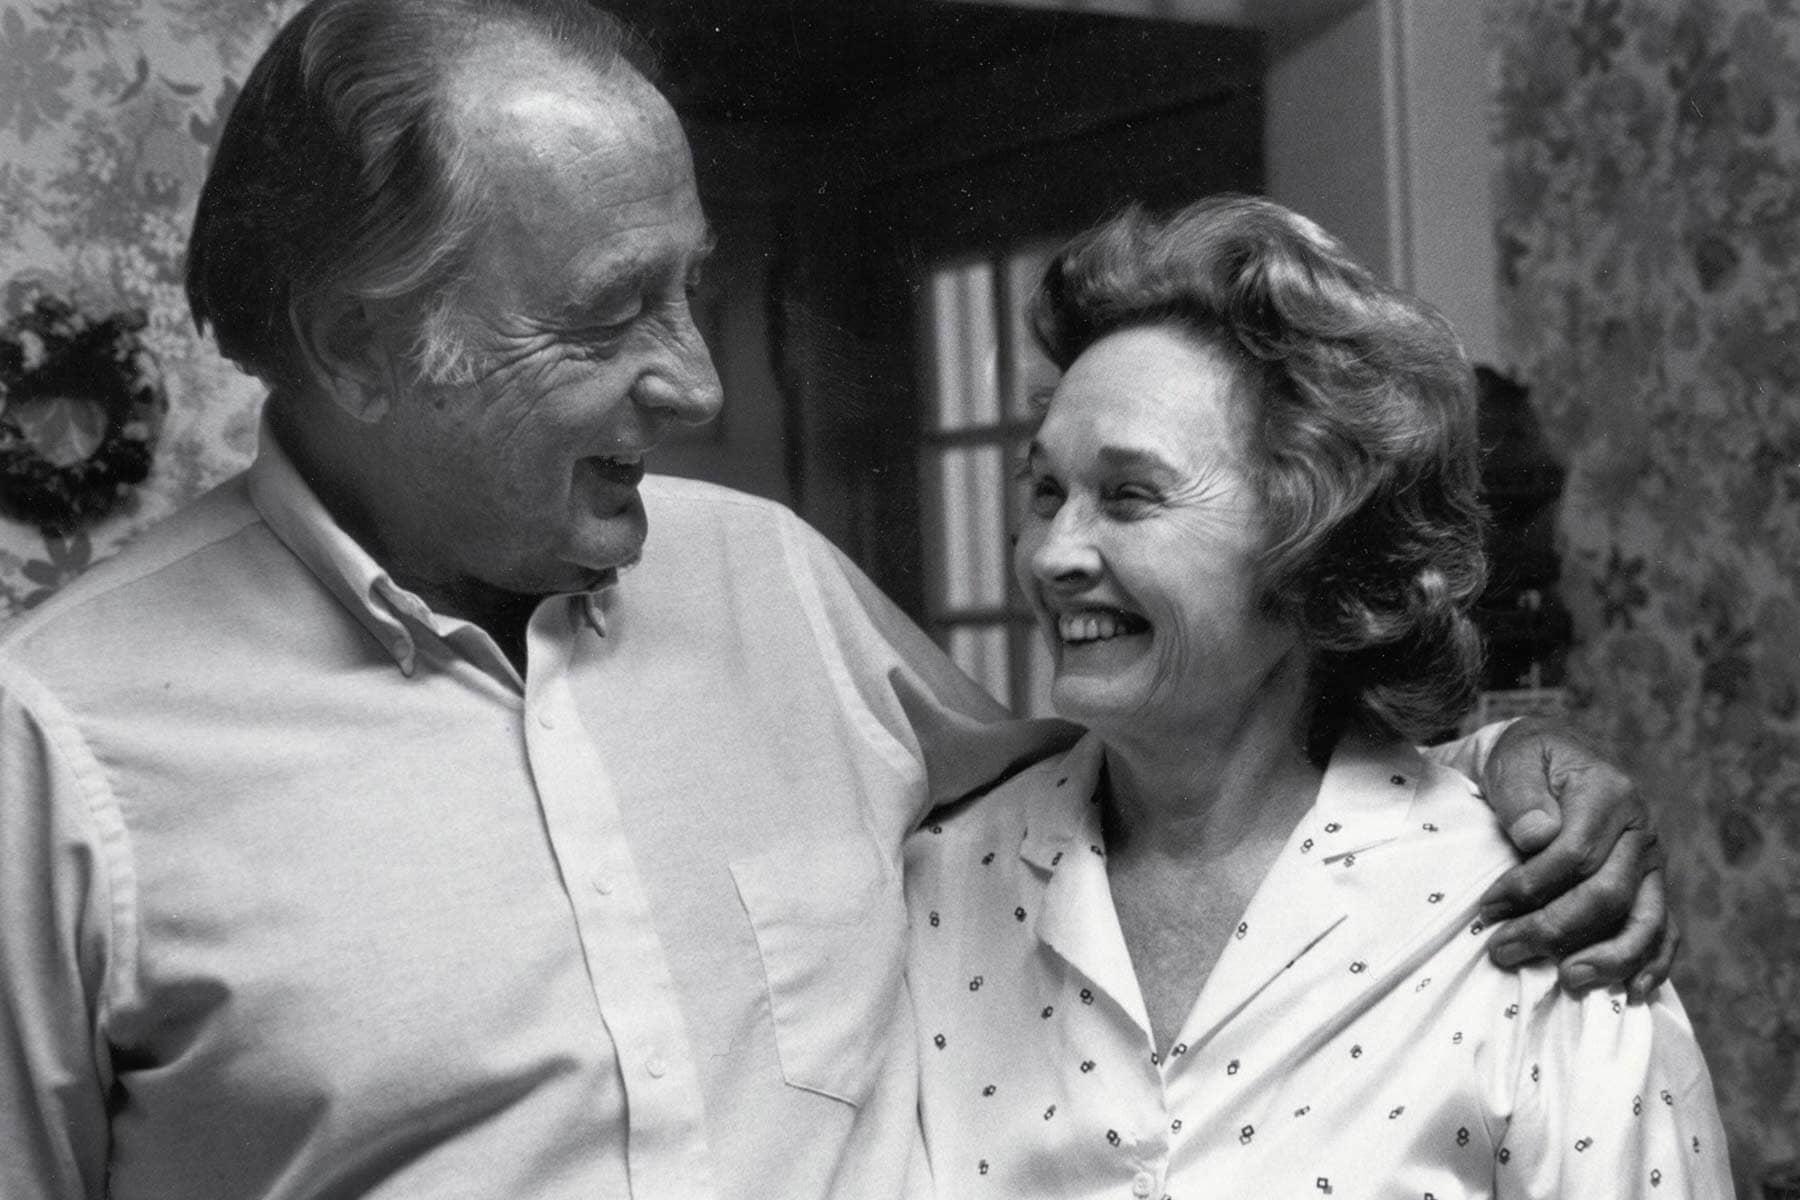 Bob and Leila Macauley